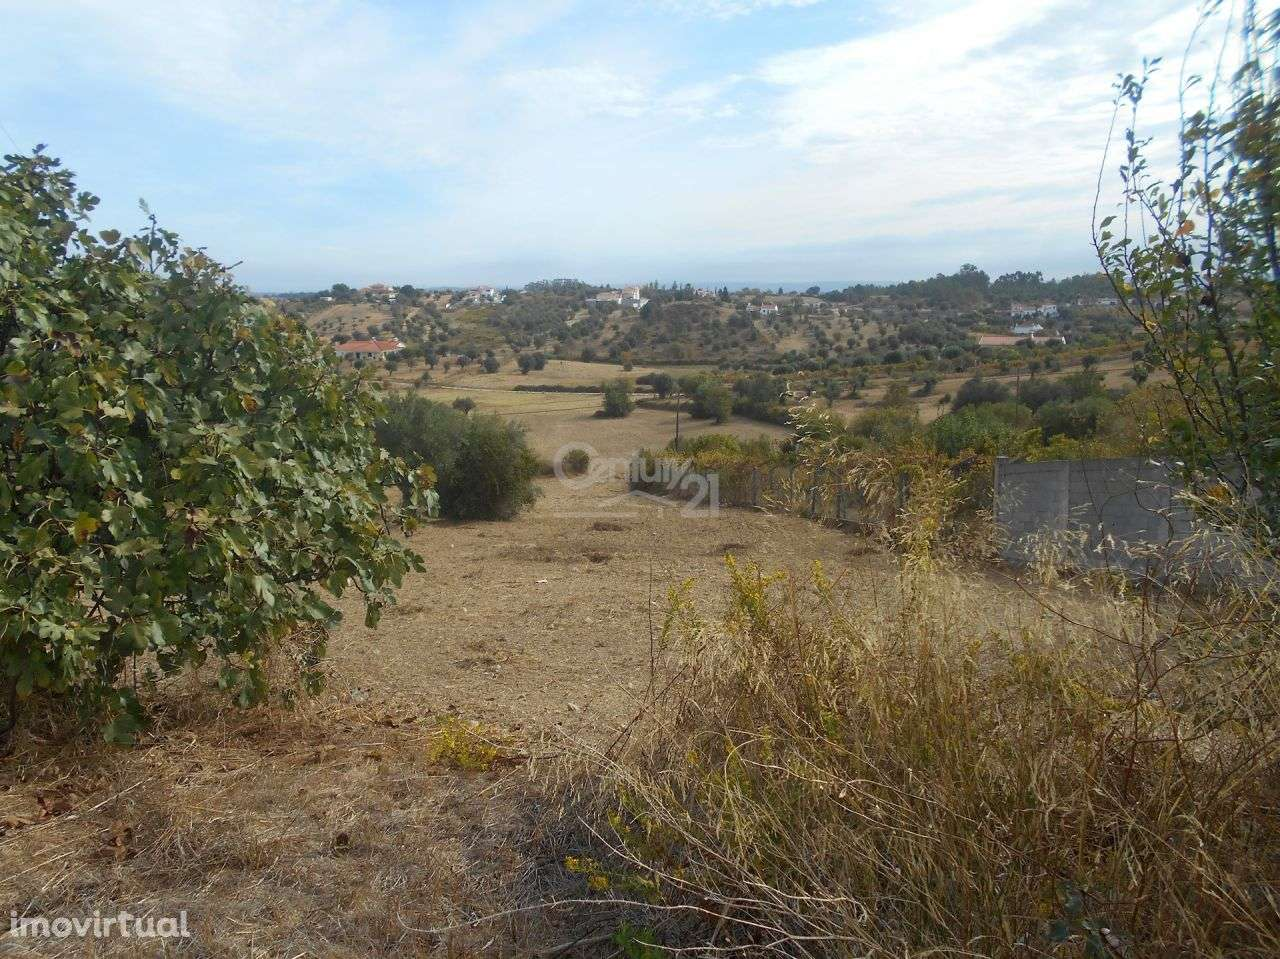 Terreno para comprar, Brogueira, Parceiros de Igreja e Alcorochel, Torres Novas, Santarém - Foto 2